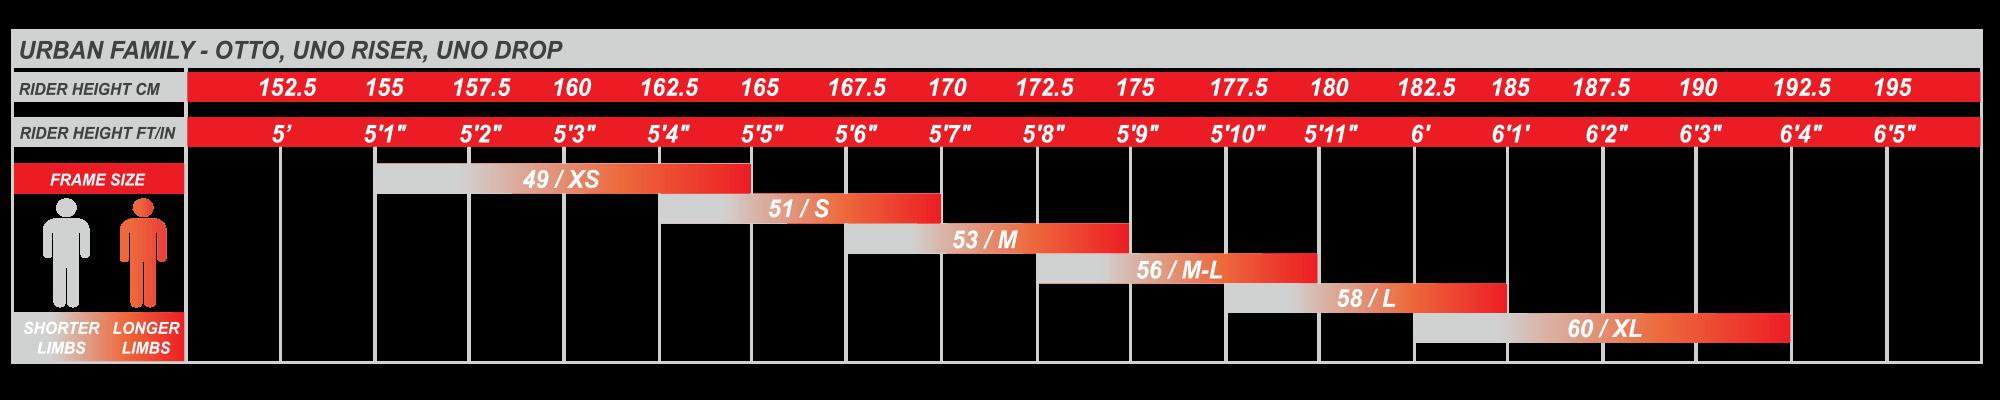 geo-size-chart-steel-urban-2018.2.png